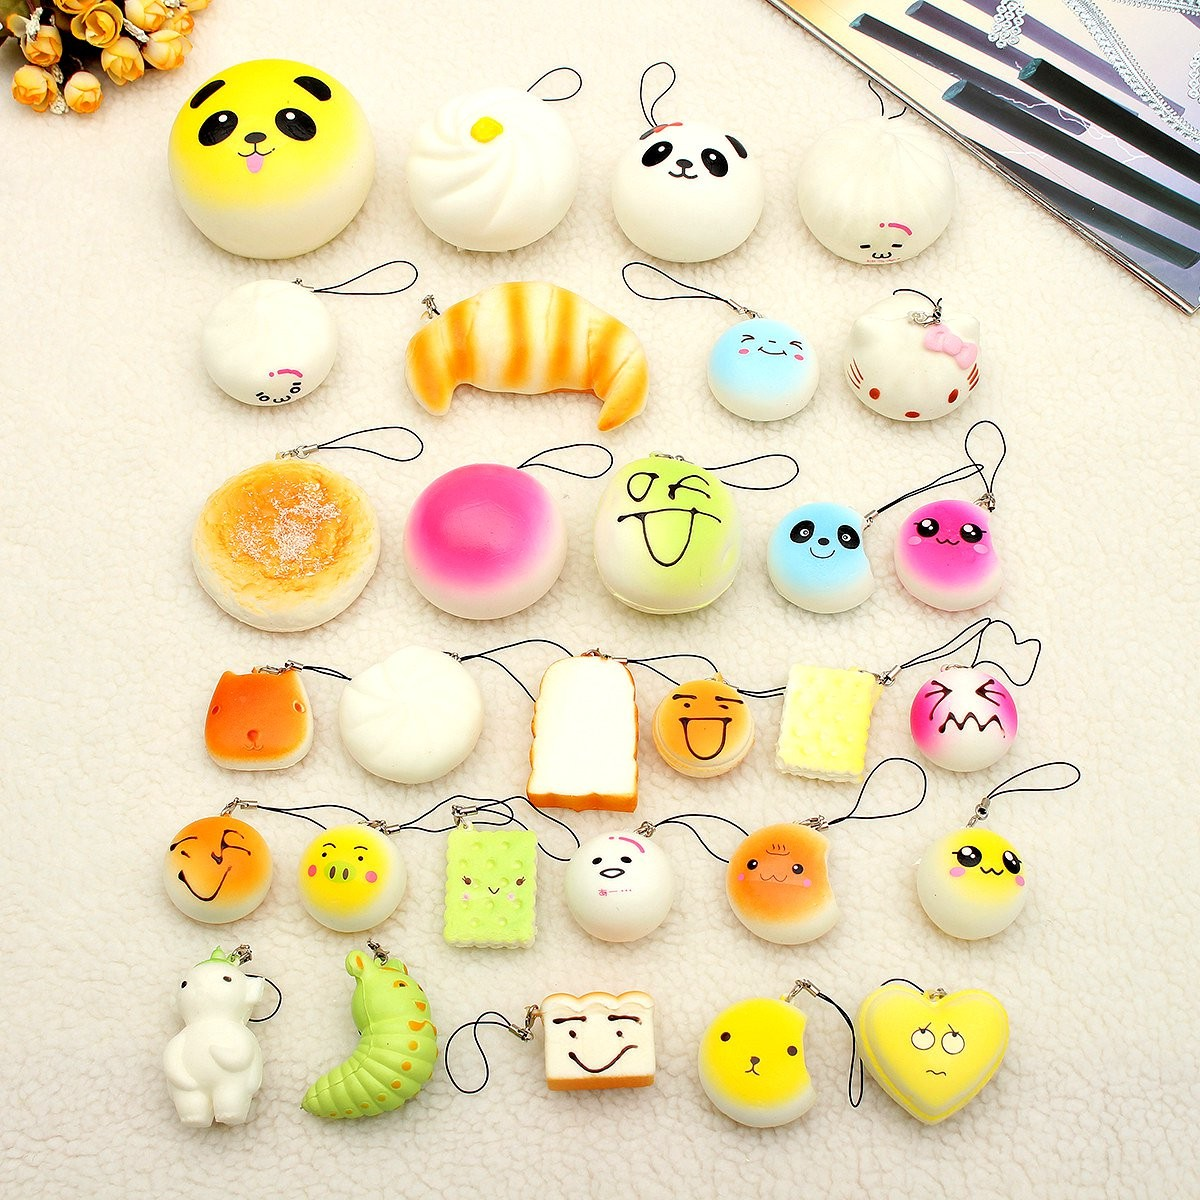 30Pcs Lovely Mini Soft Expression Cartoon Bread Ice-cream Bun Cellphone Straps Charms Random Squishy Toys Sets